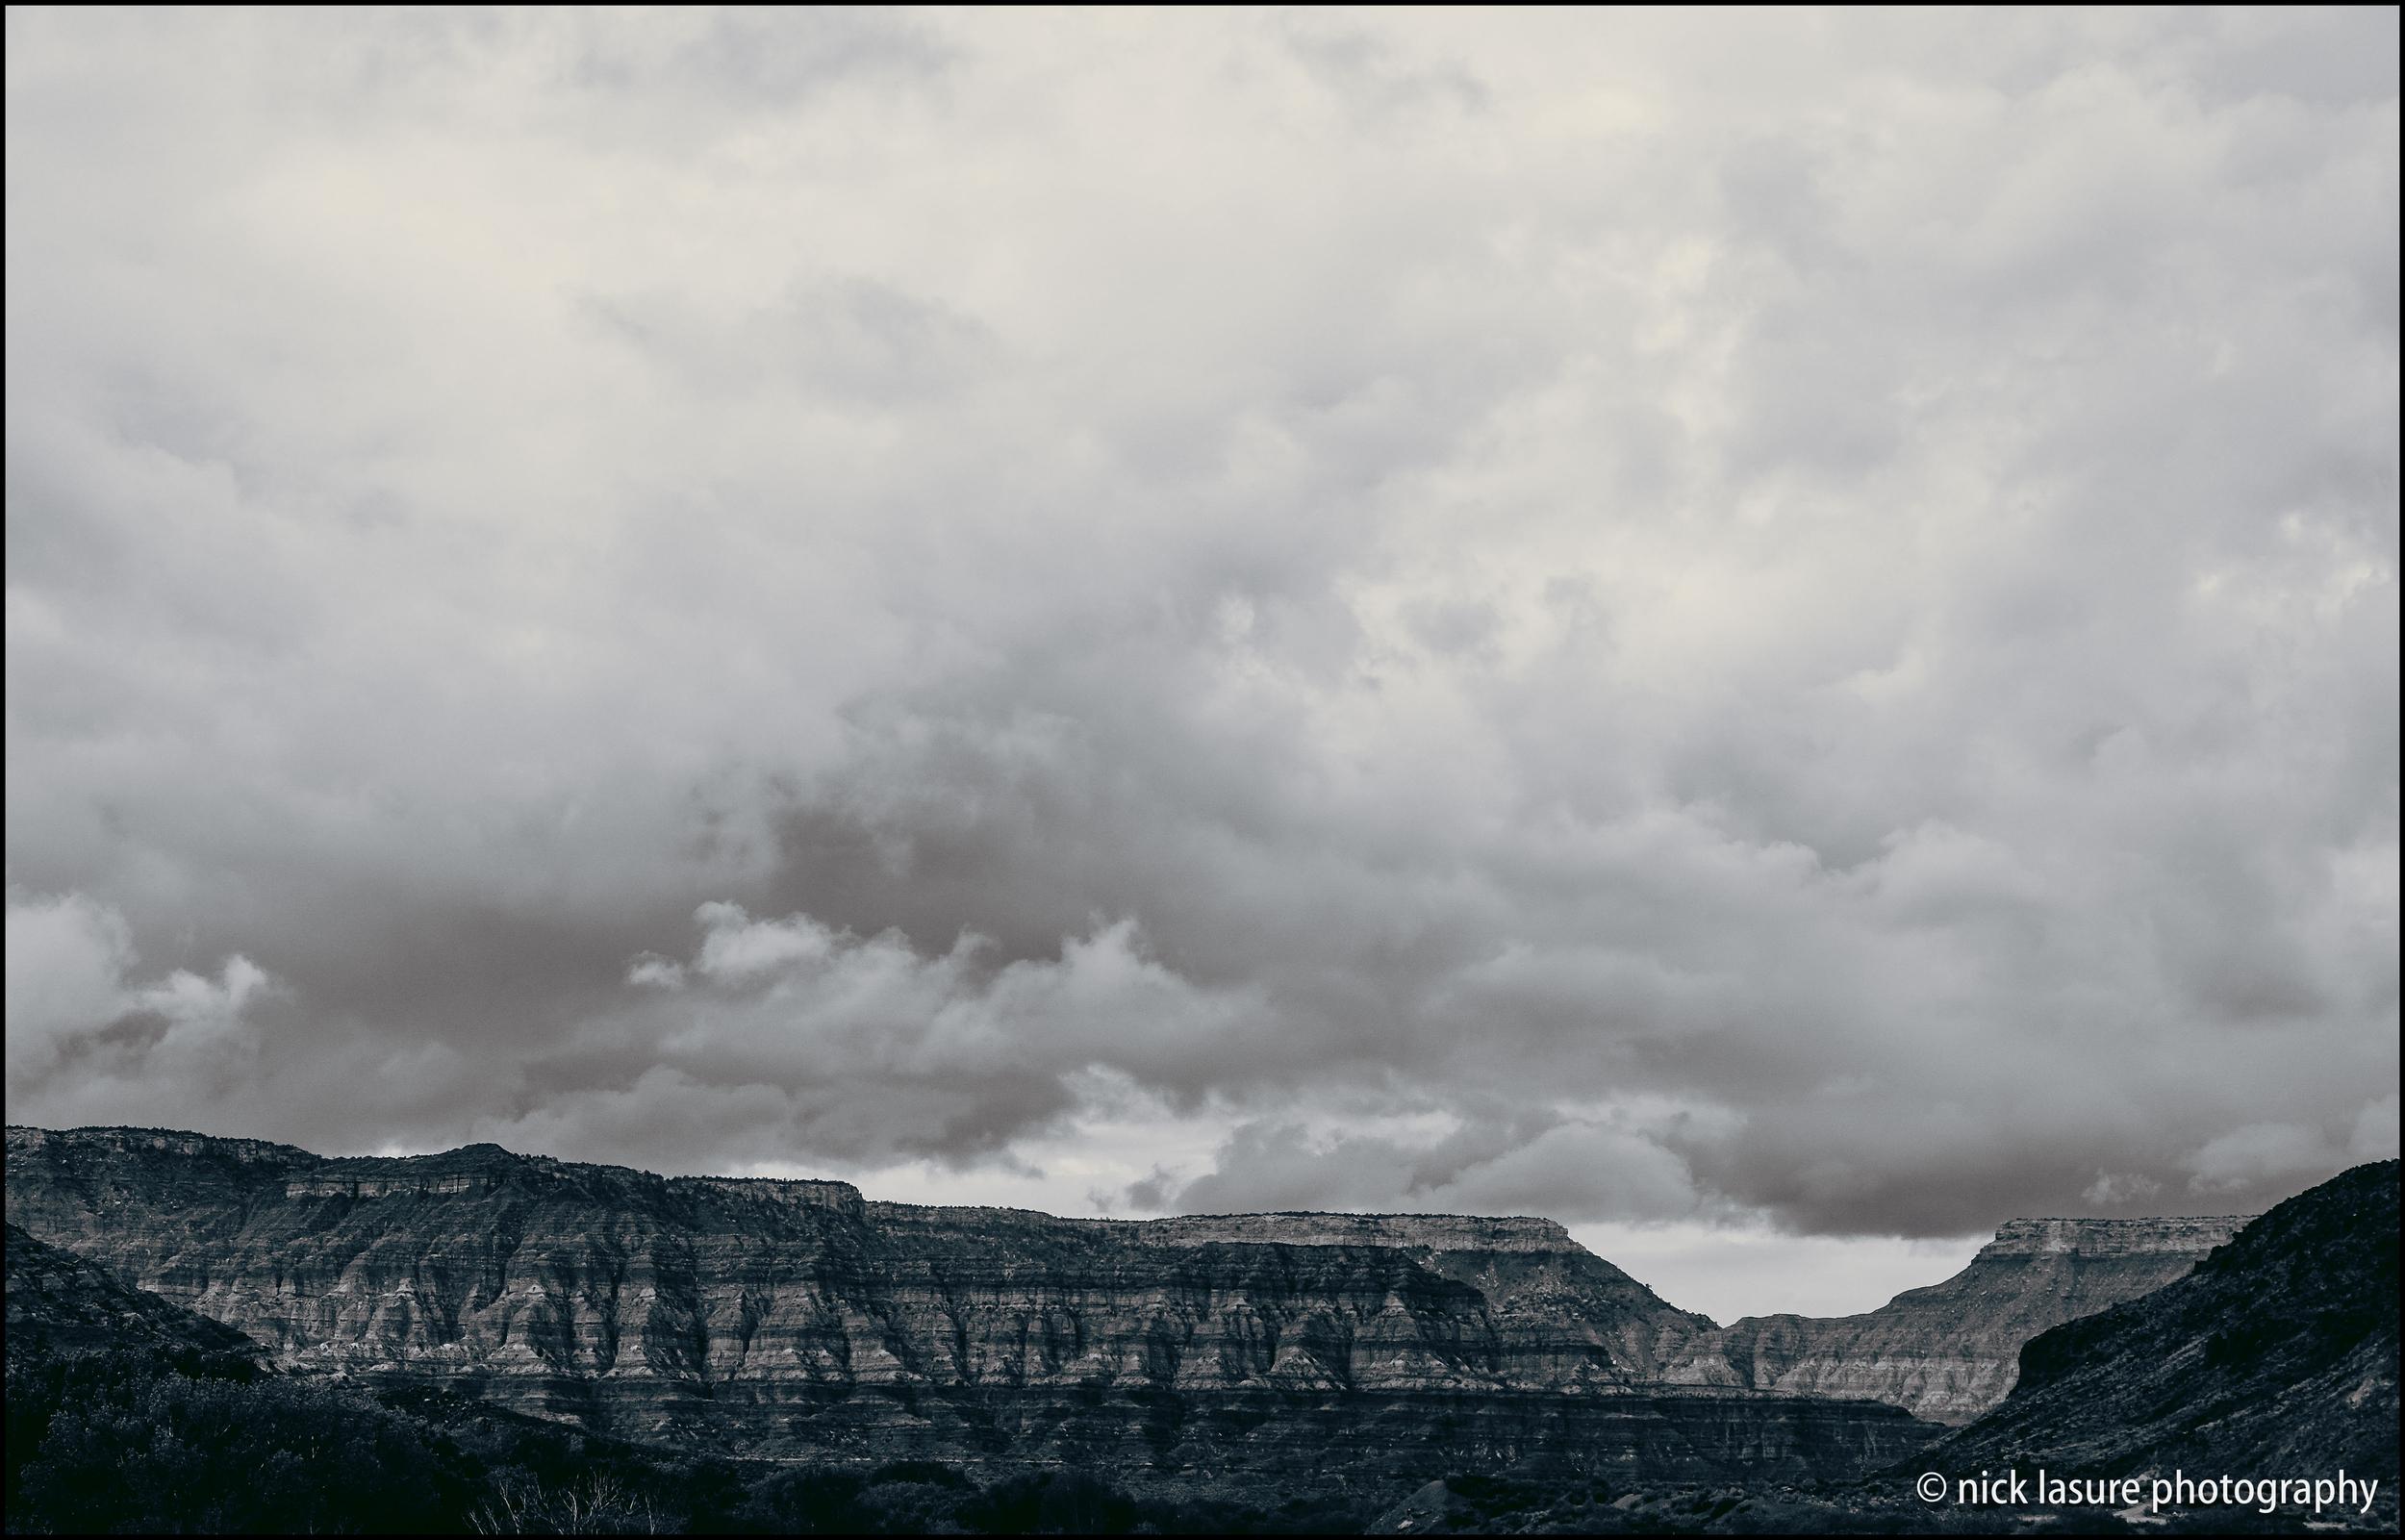 Mesas & Clouds - Fuji X-T1